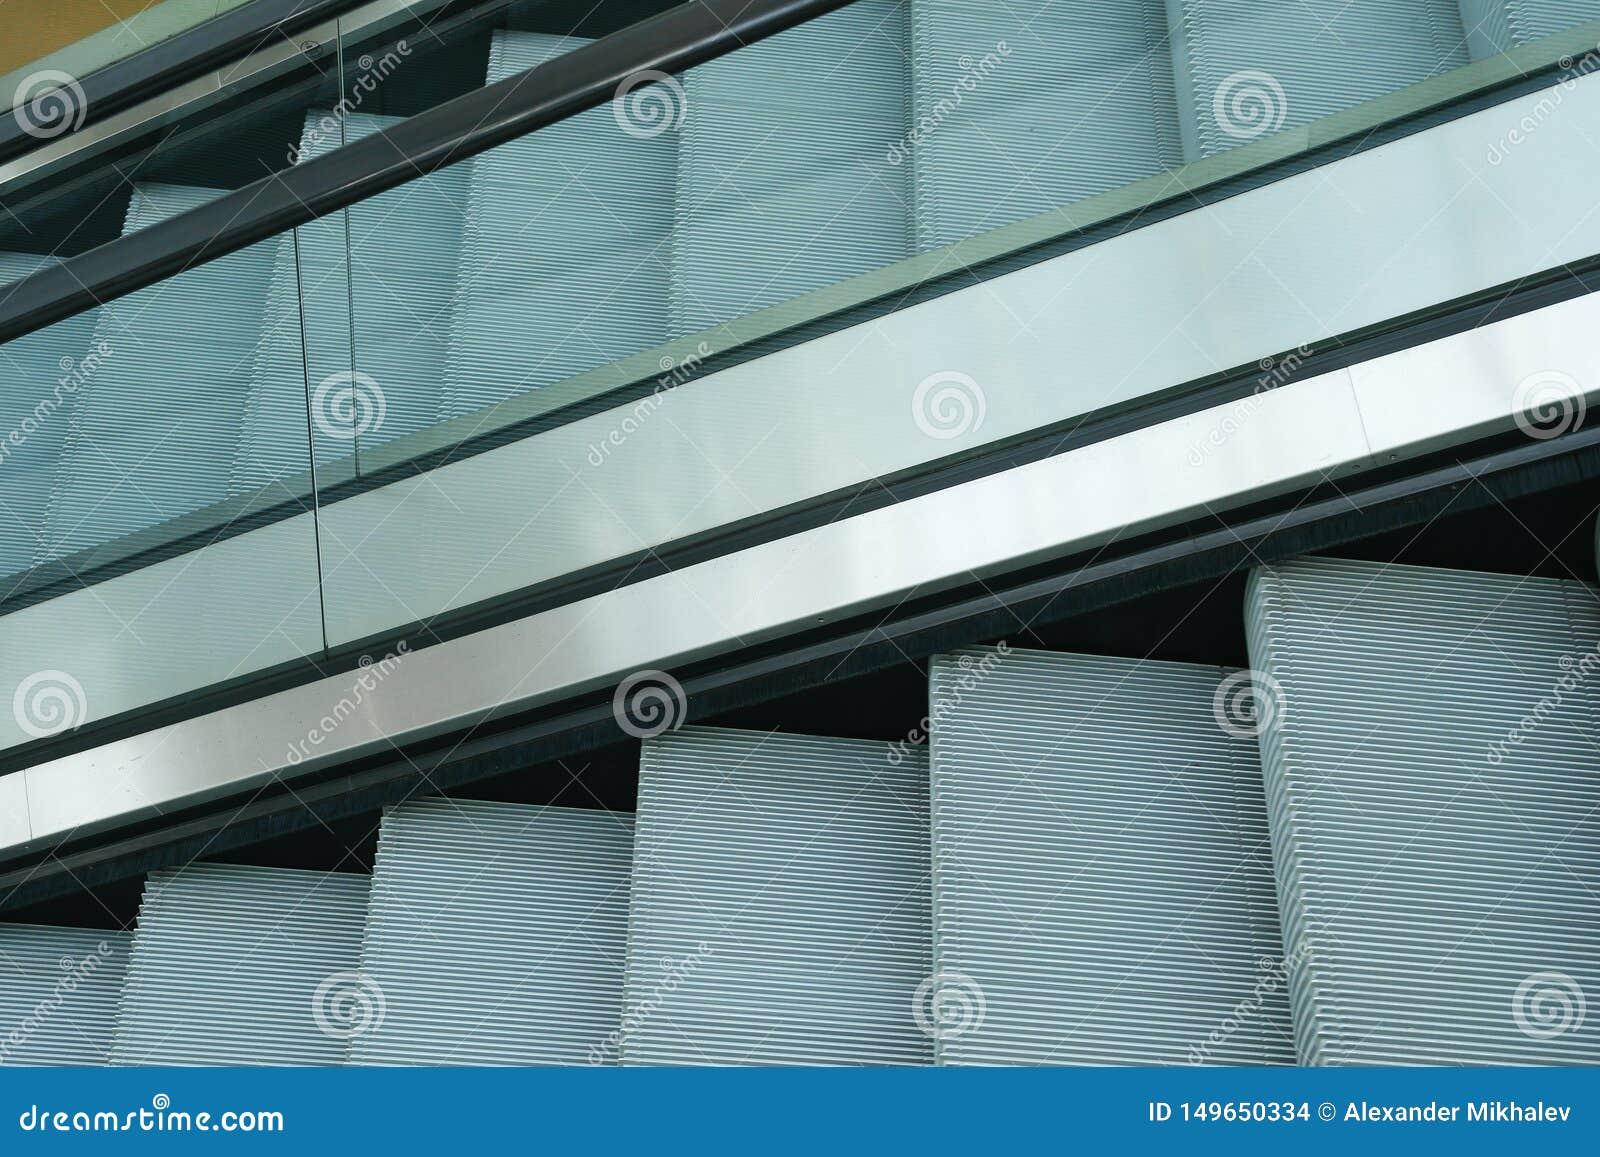 Modern escalator in the mall